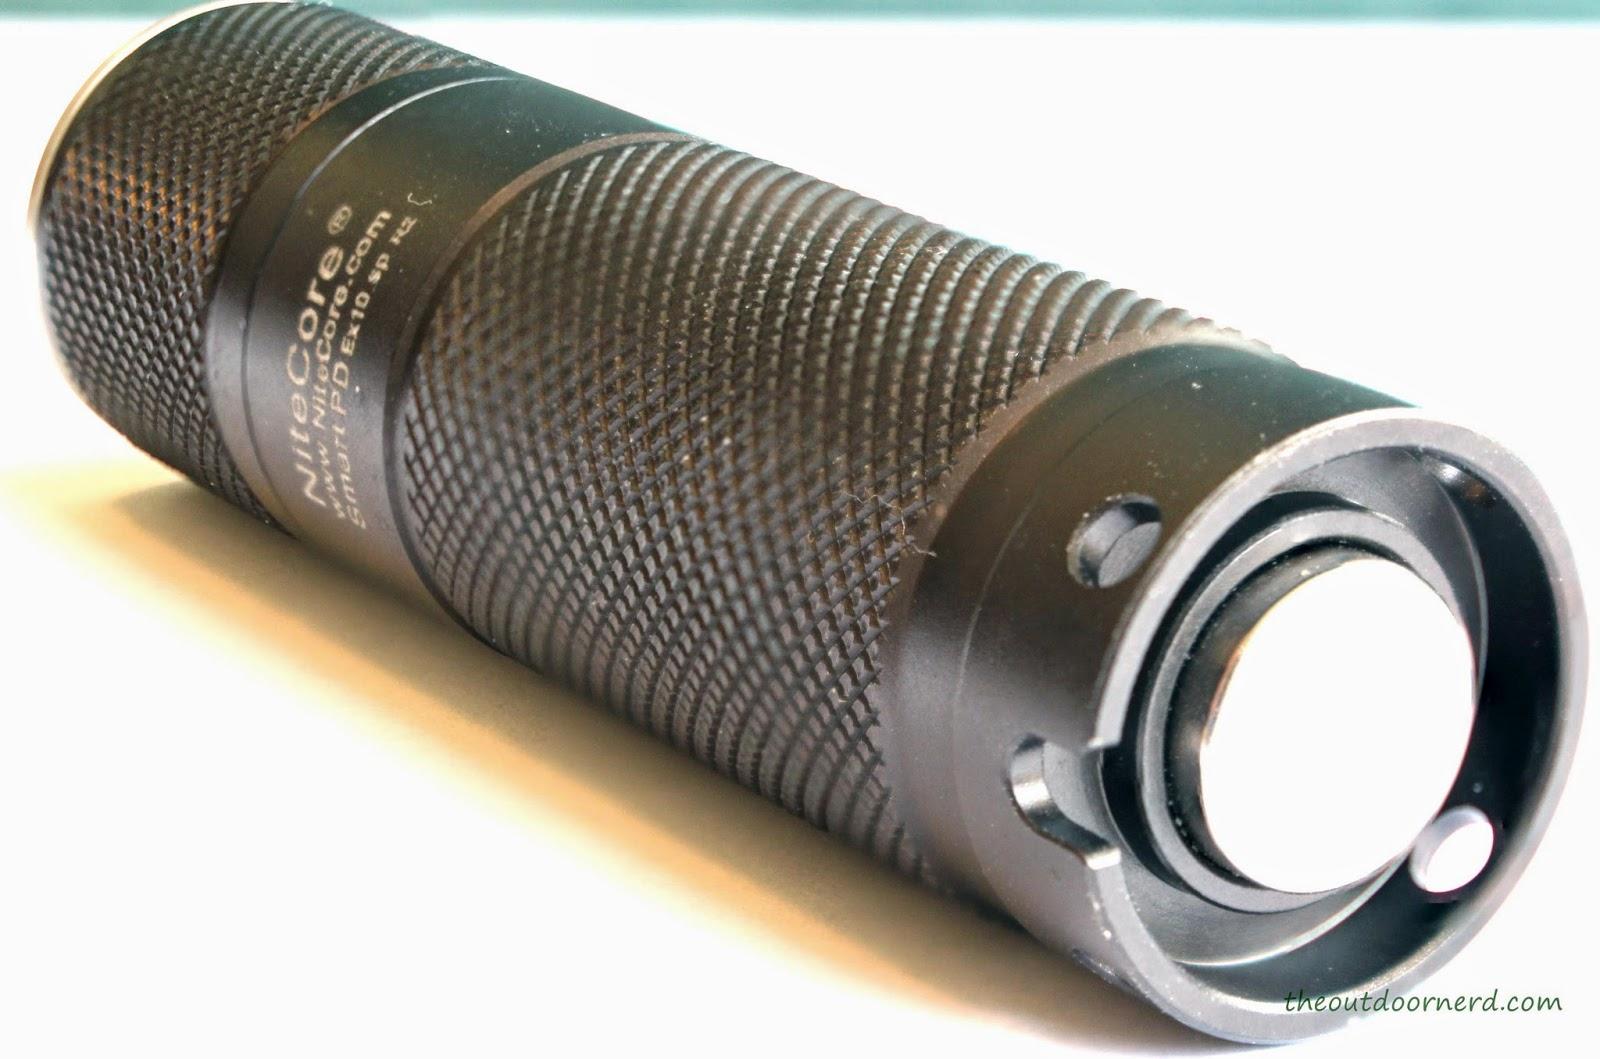 Nitecore Ex10 1xCR123A Flashlight : Rear View